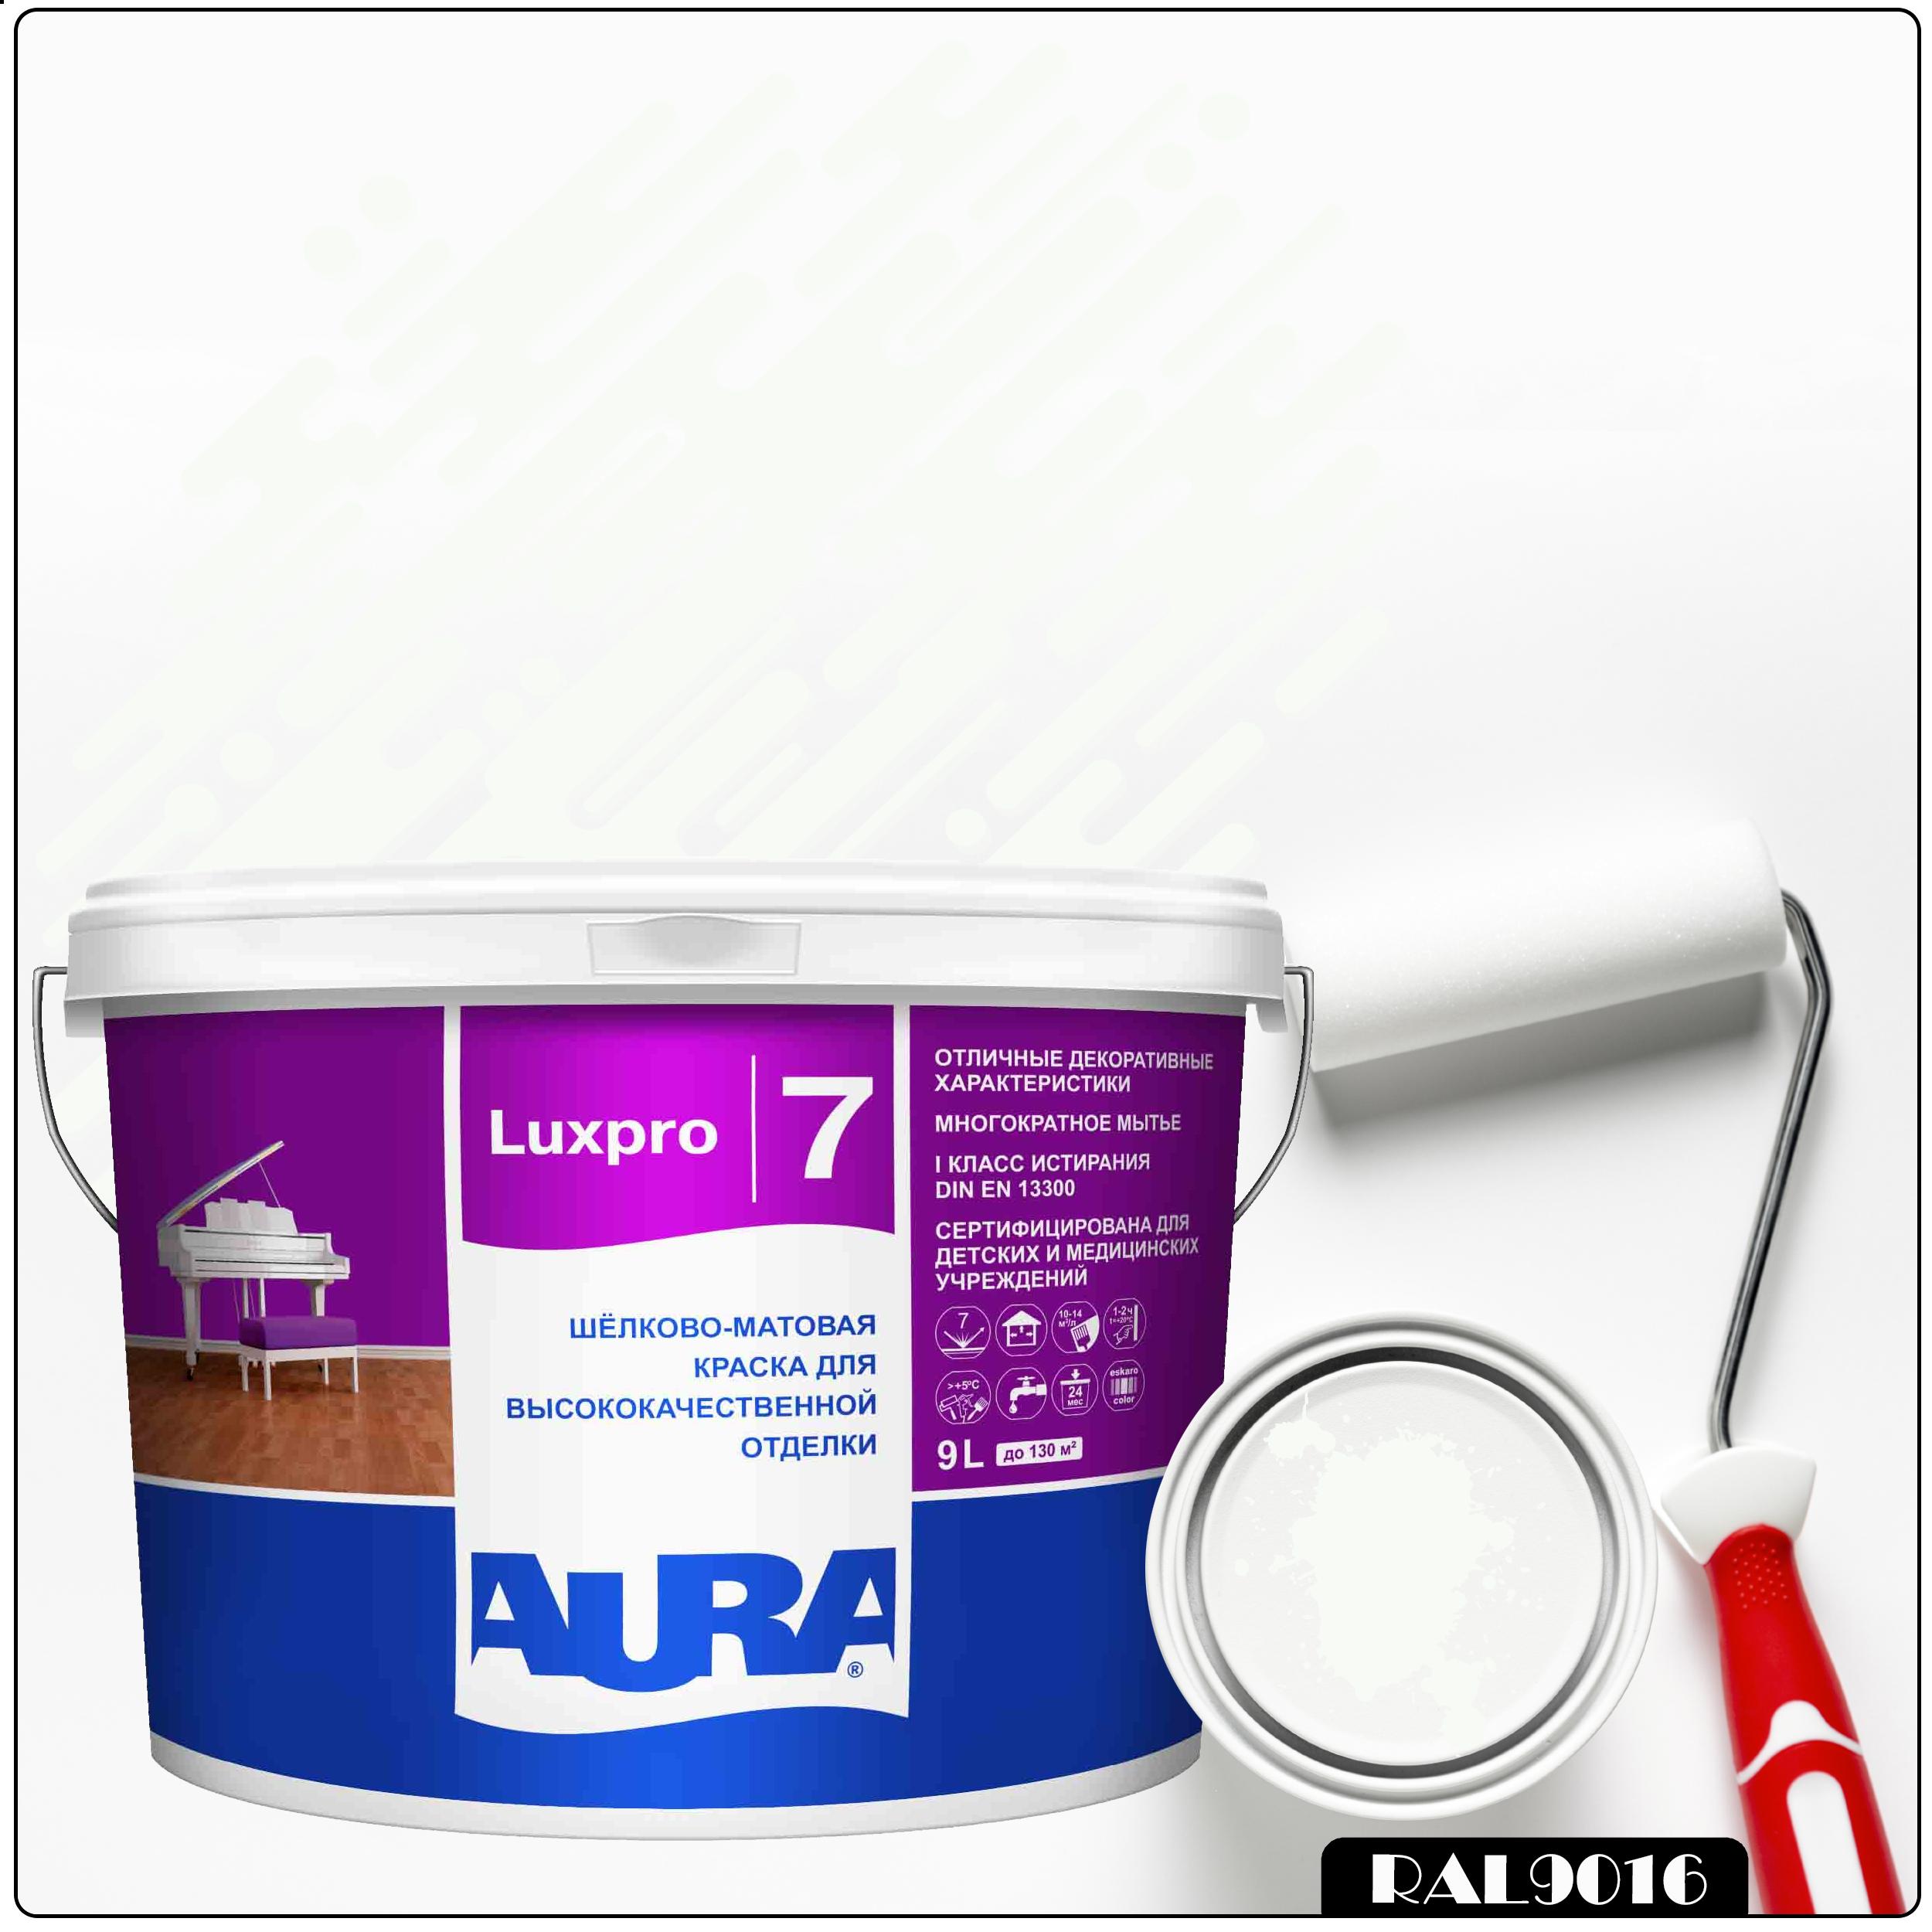 Фото 8 - Краска Aura LuxPRO 7, RAL 9016 Белый транспортный, латексная, шелково-матовая, интерьерная, 9л, Аура.